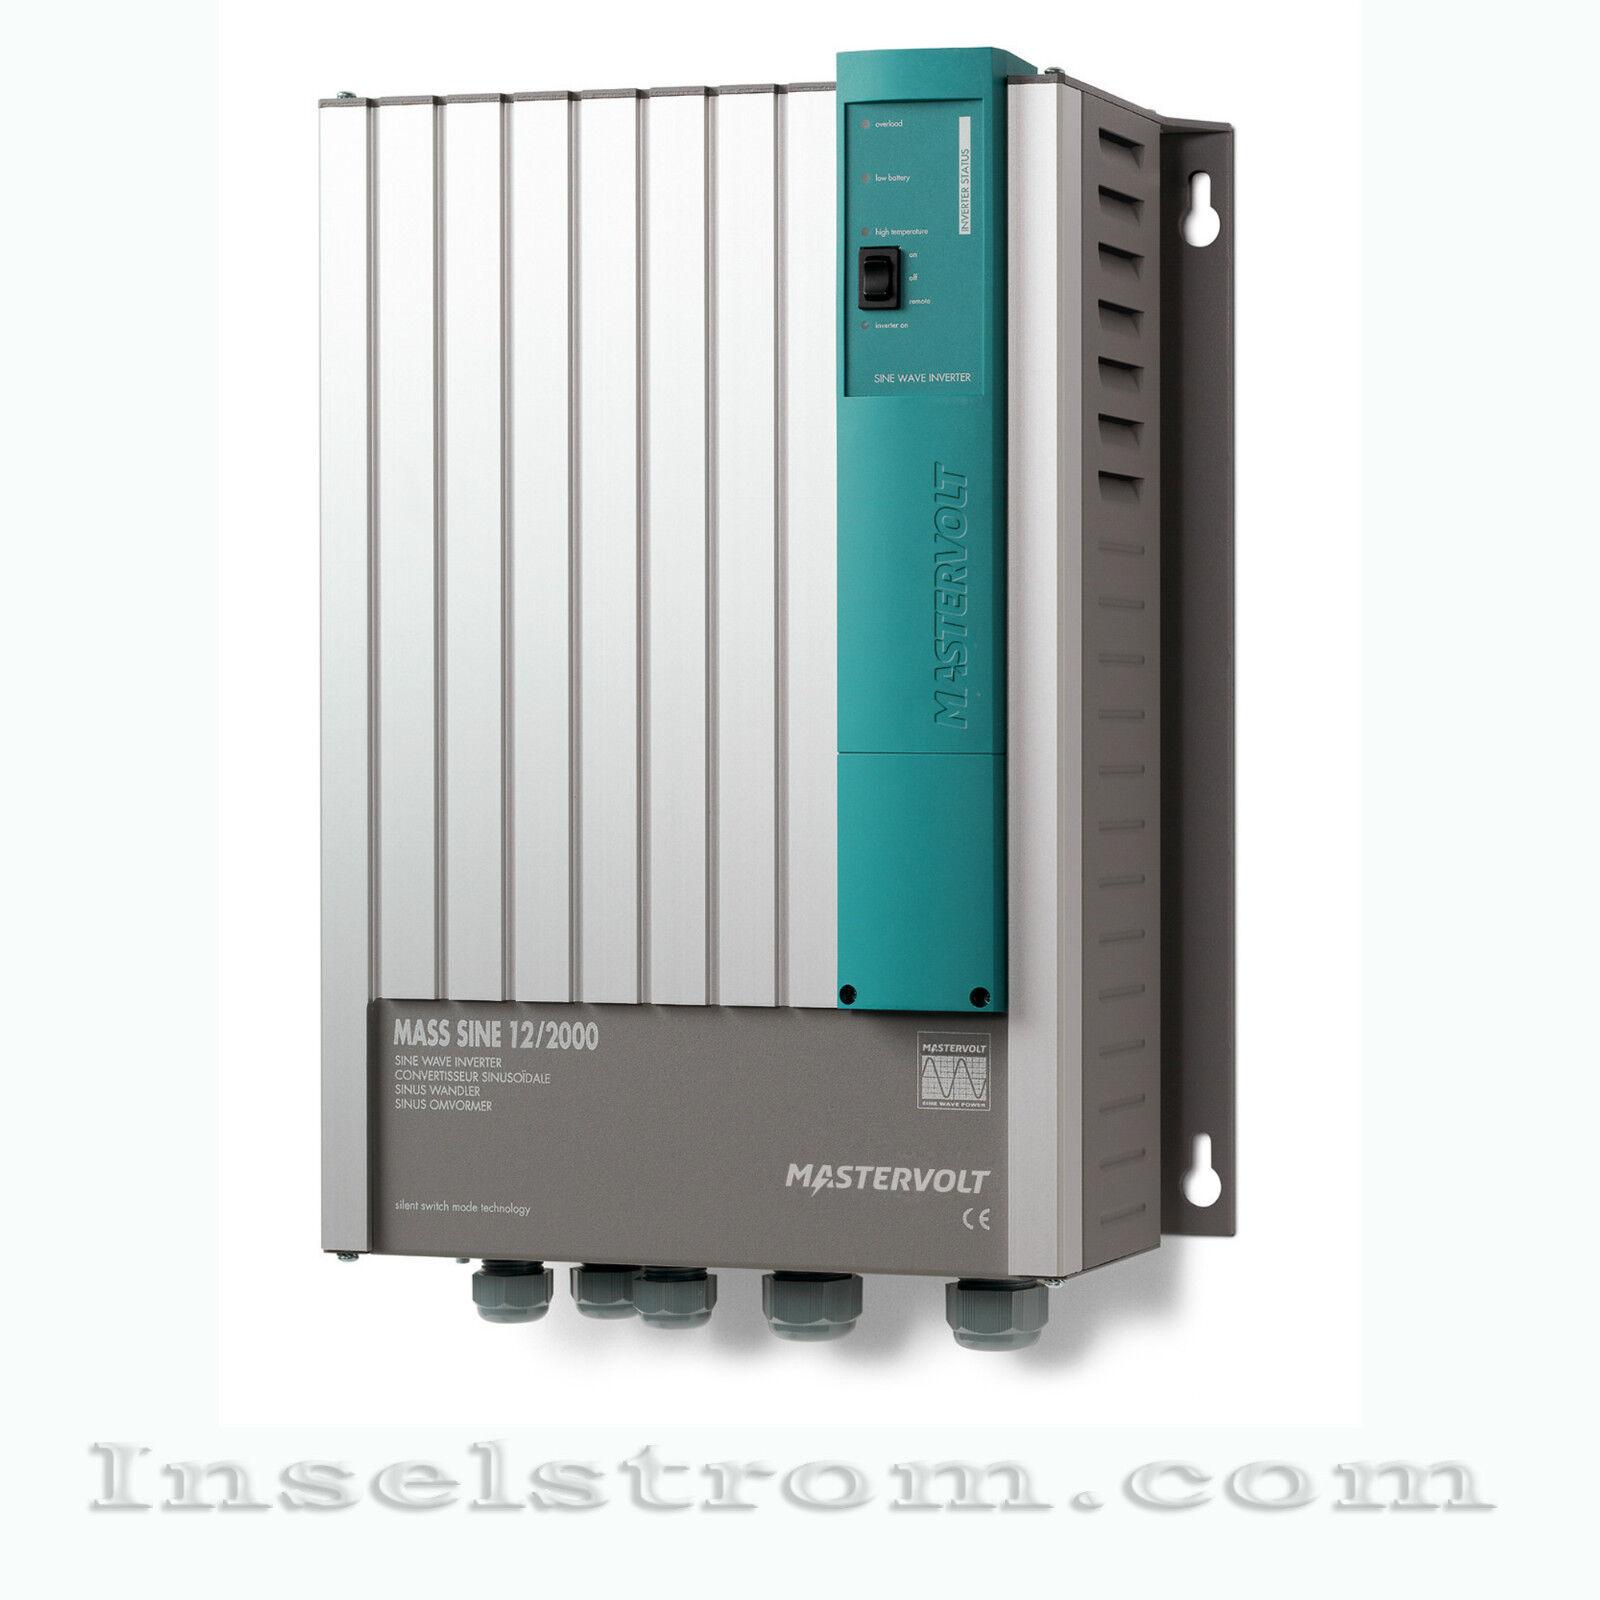 Mastervolt Wechselrichter Mass Sine 12/2000 Wechselrichter Mastervolt Inverter ac5783